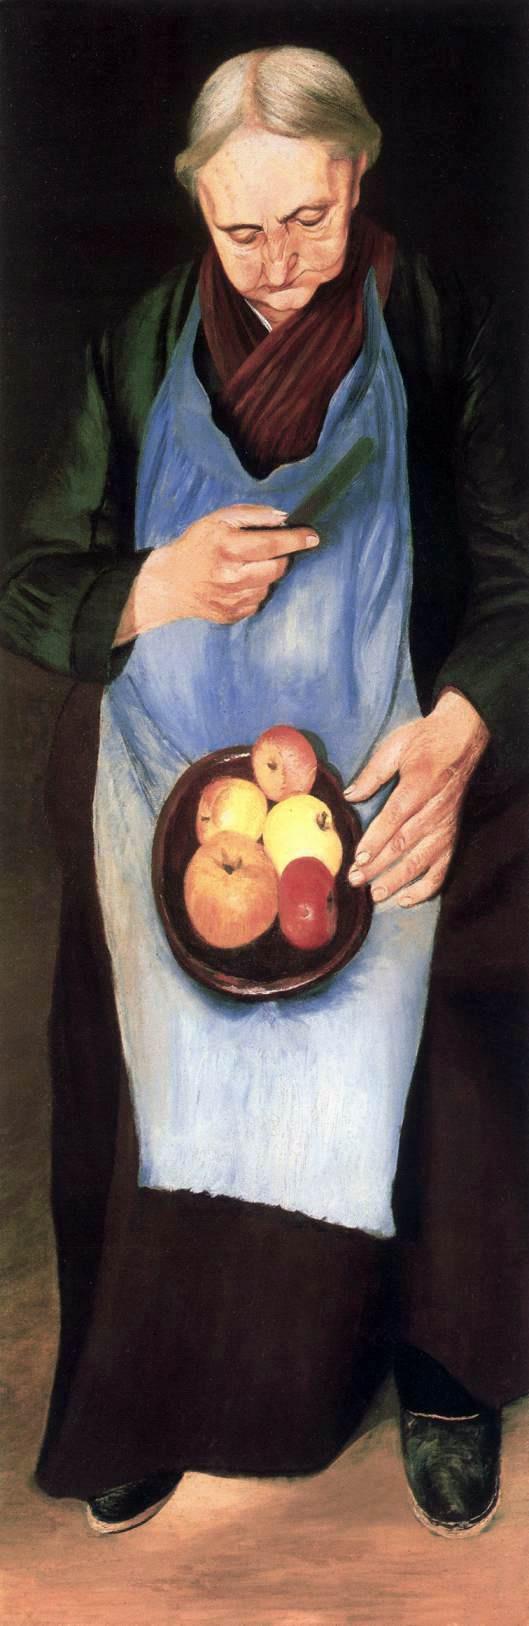 Tivadar Kostka Chontvari. Old woman with apples